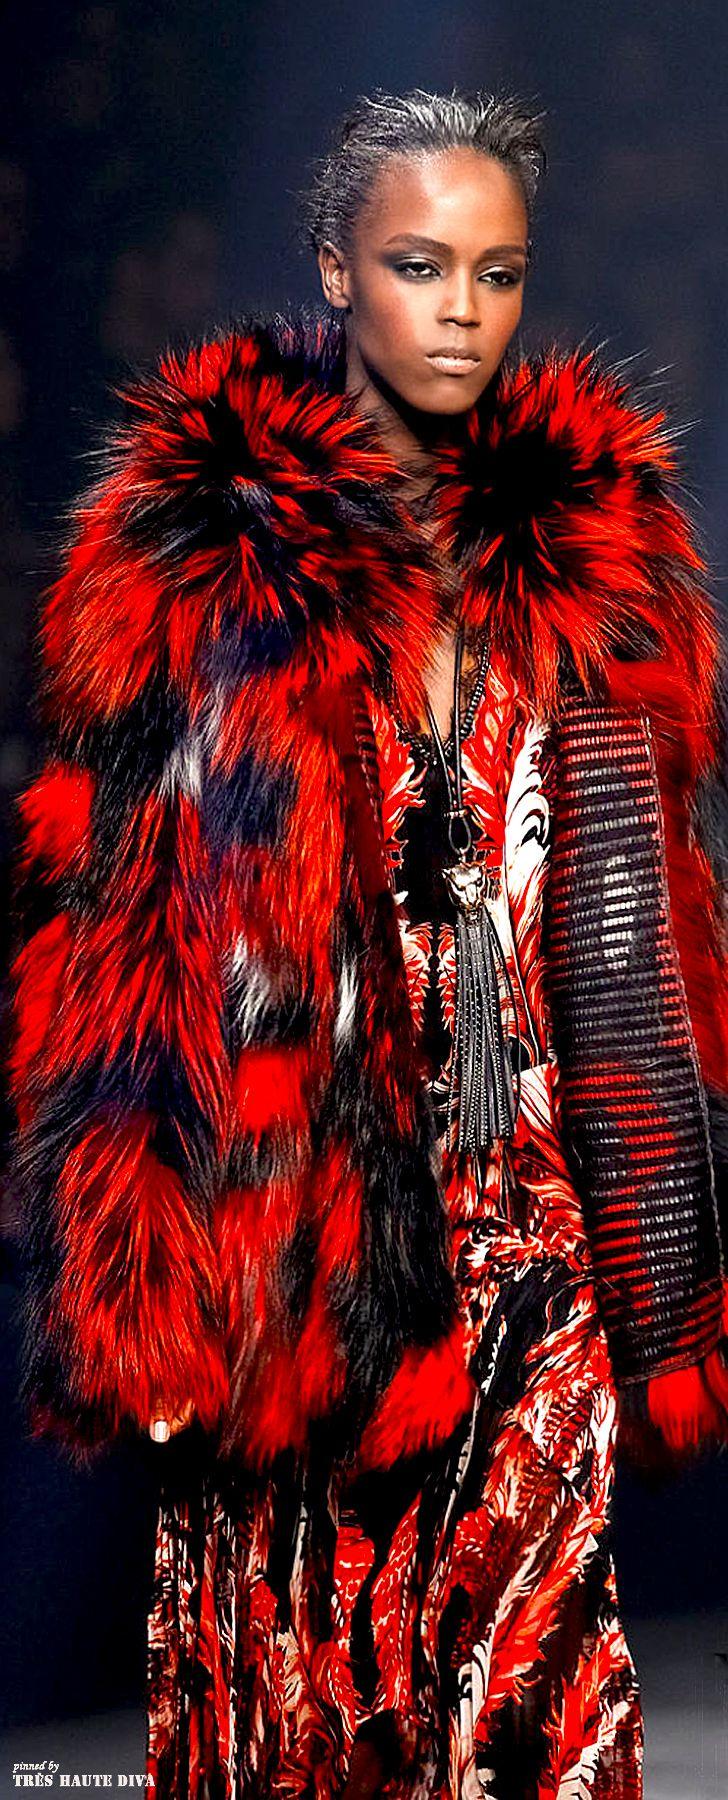 Milan Fashion Week Roberto #Cavalli Fall/Winter 2014 RTW #milanfashion #DecoArt24.pl